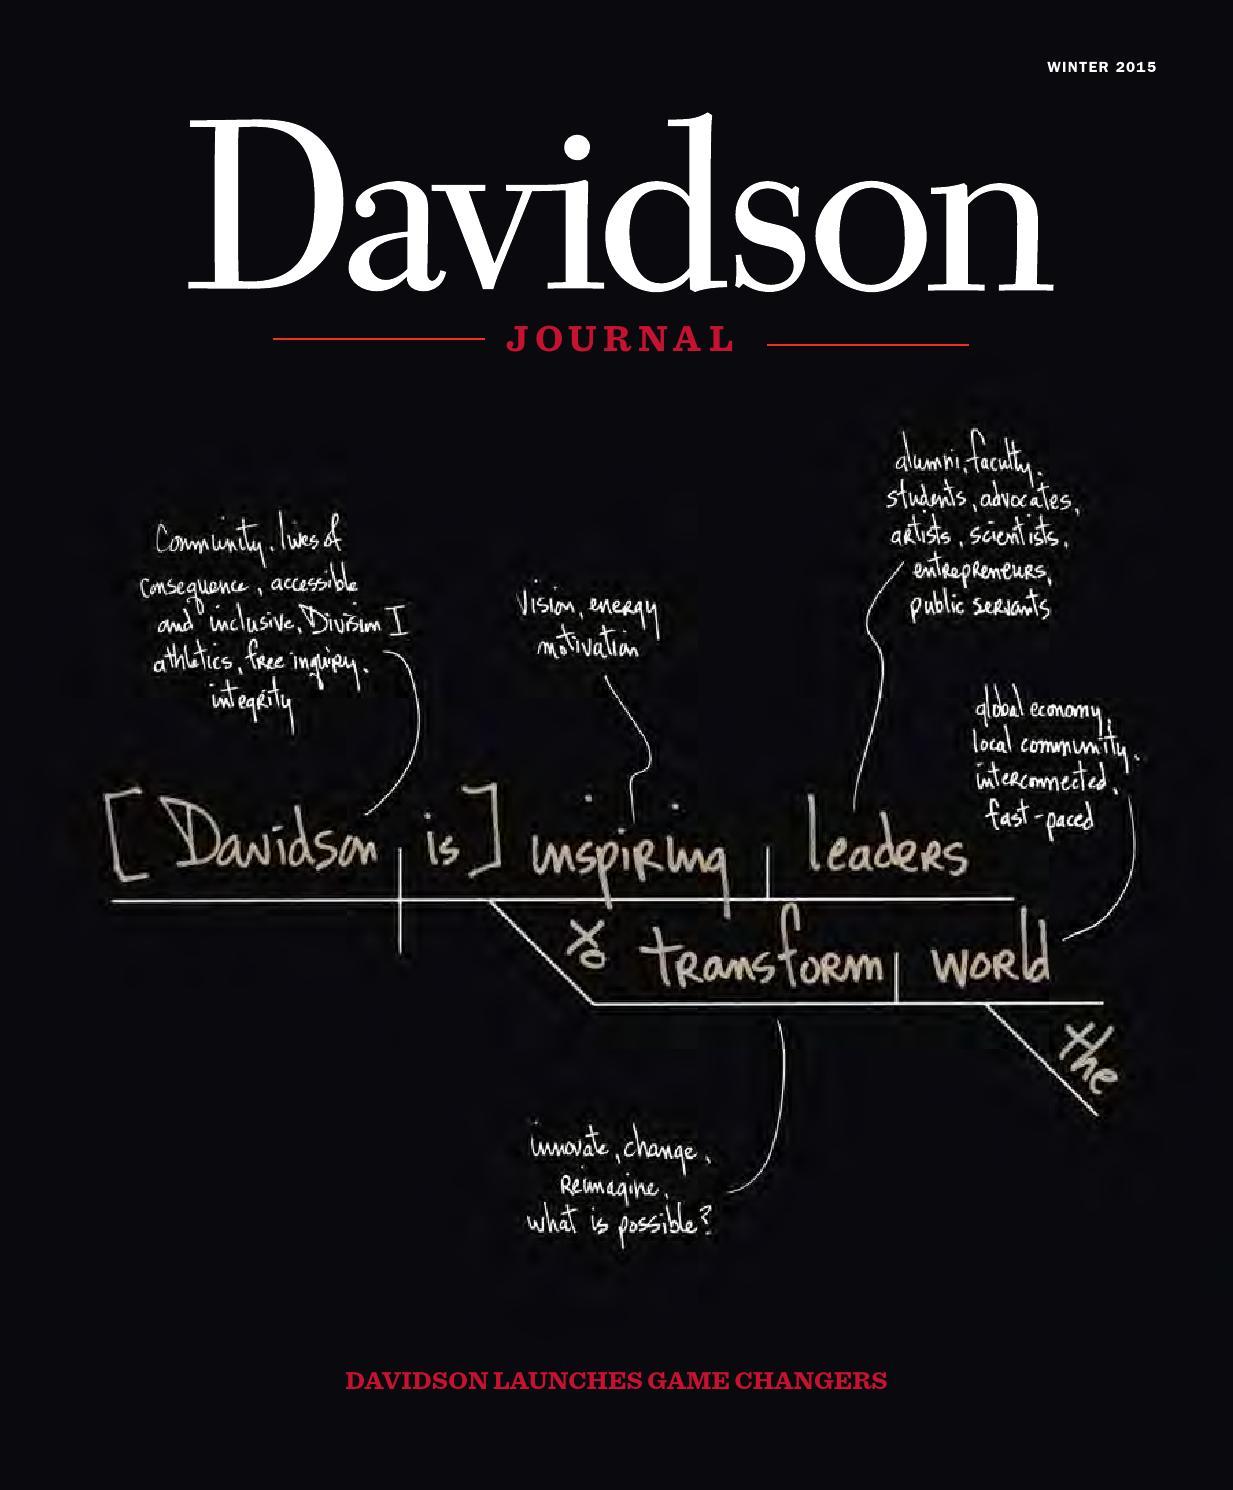 Davidson journal winter 2015 by davidson journal issuu stopboris Gallery